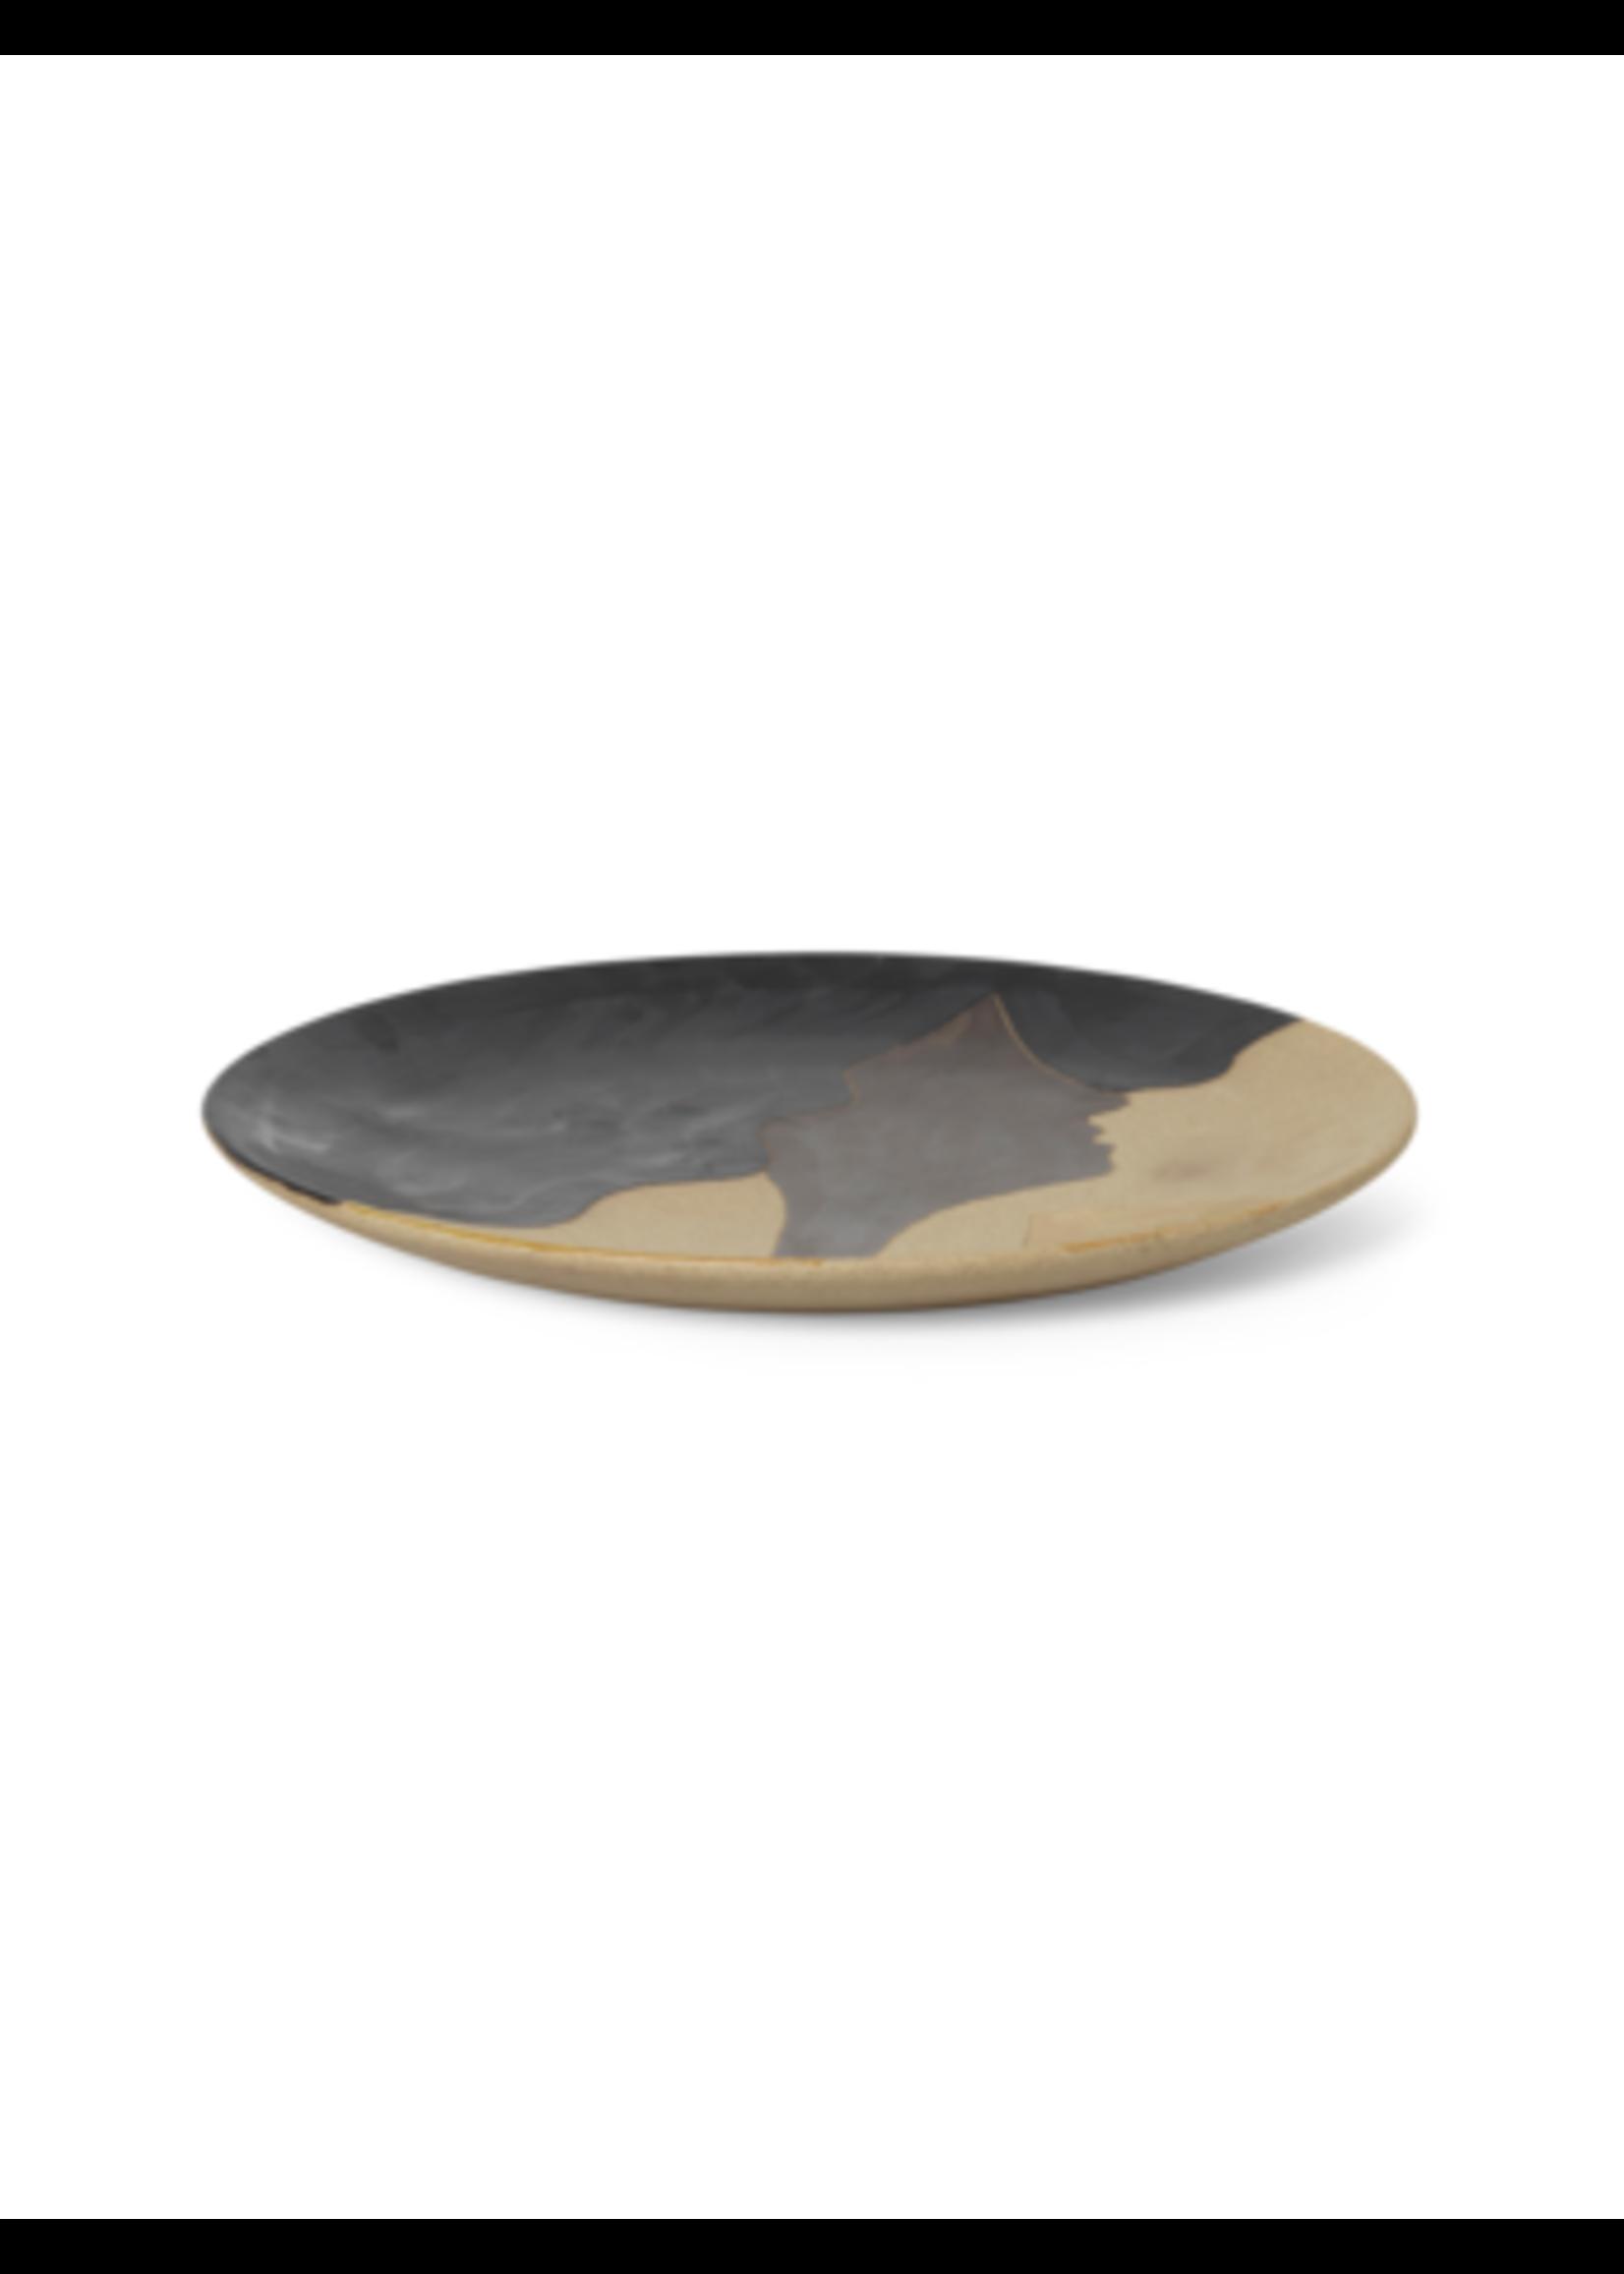 ferm LIVING ferm LIVING Ceramic Platter - Aya